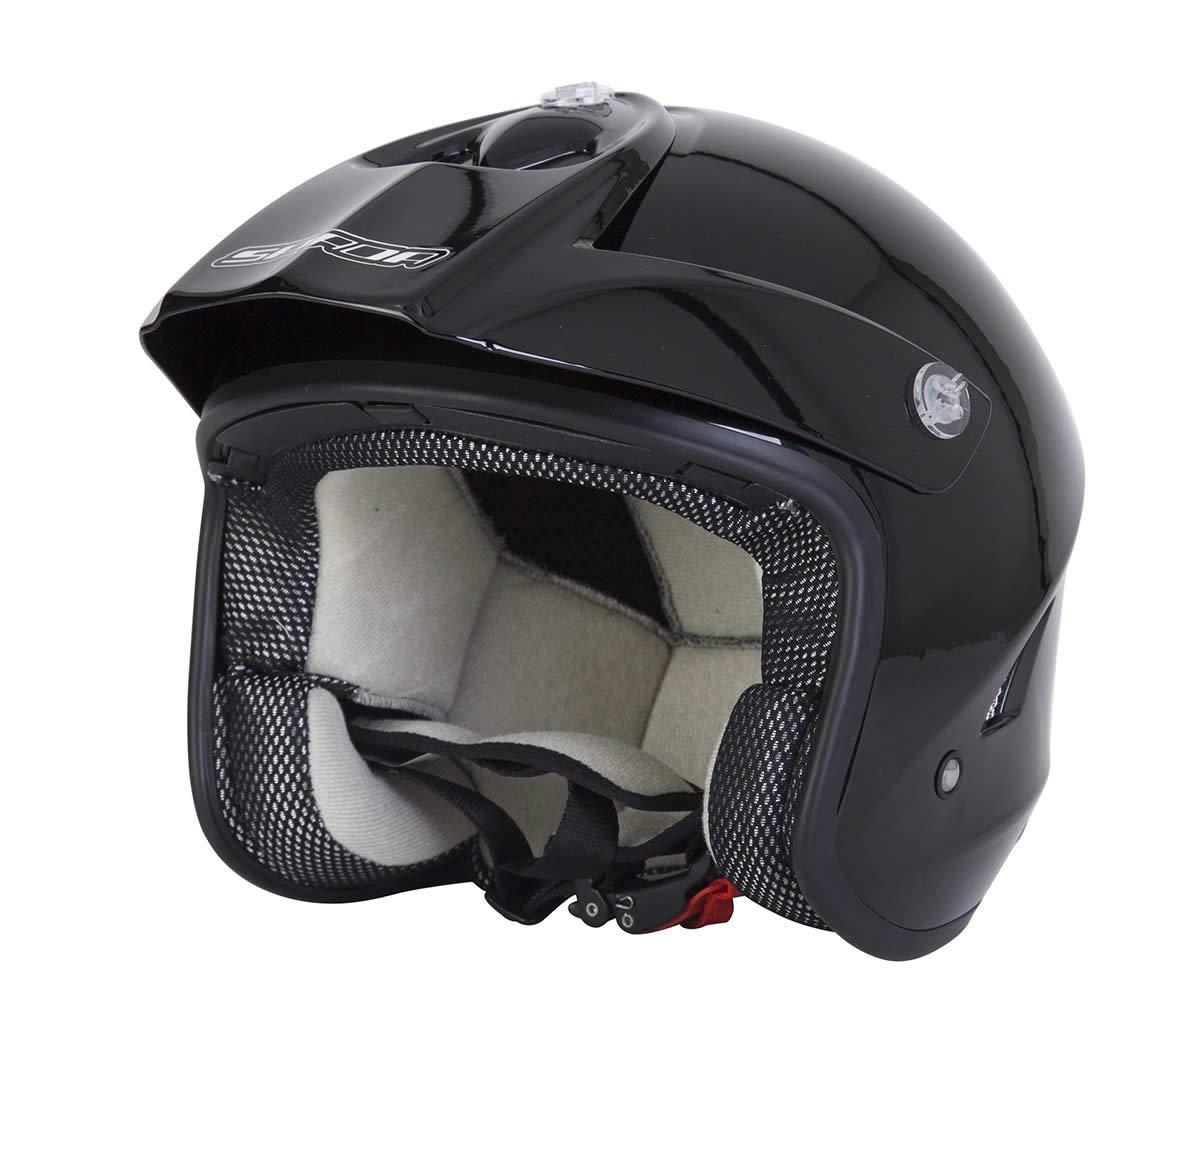 Spada Edge Trials Moto Enduro Off Road Casco a Viso Aperto Nero OPACO